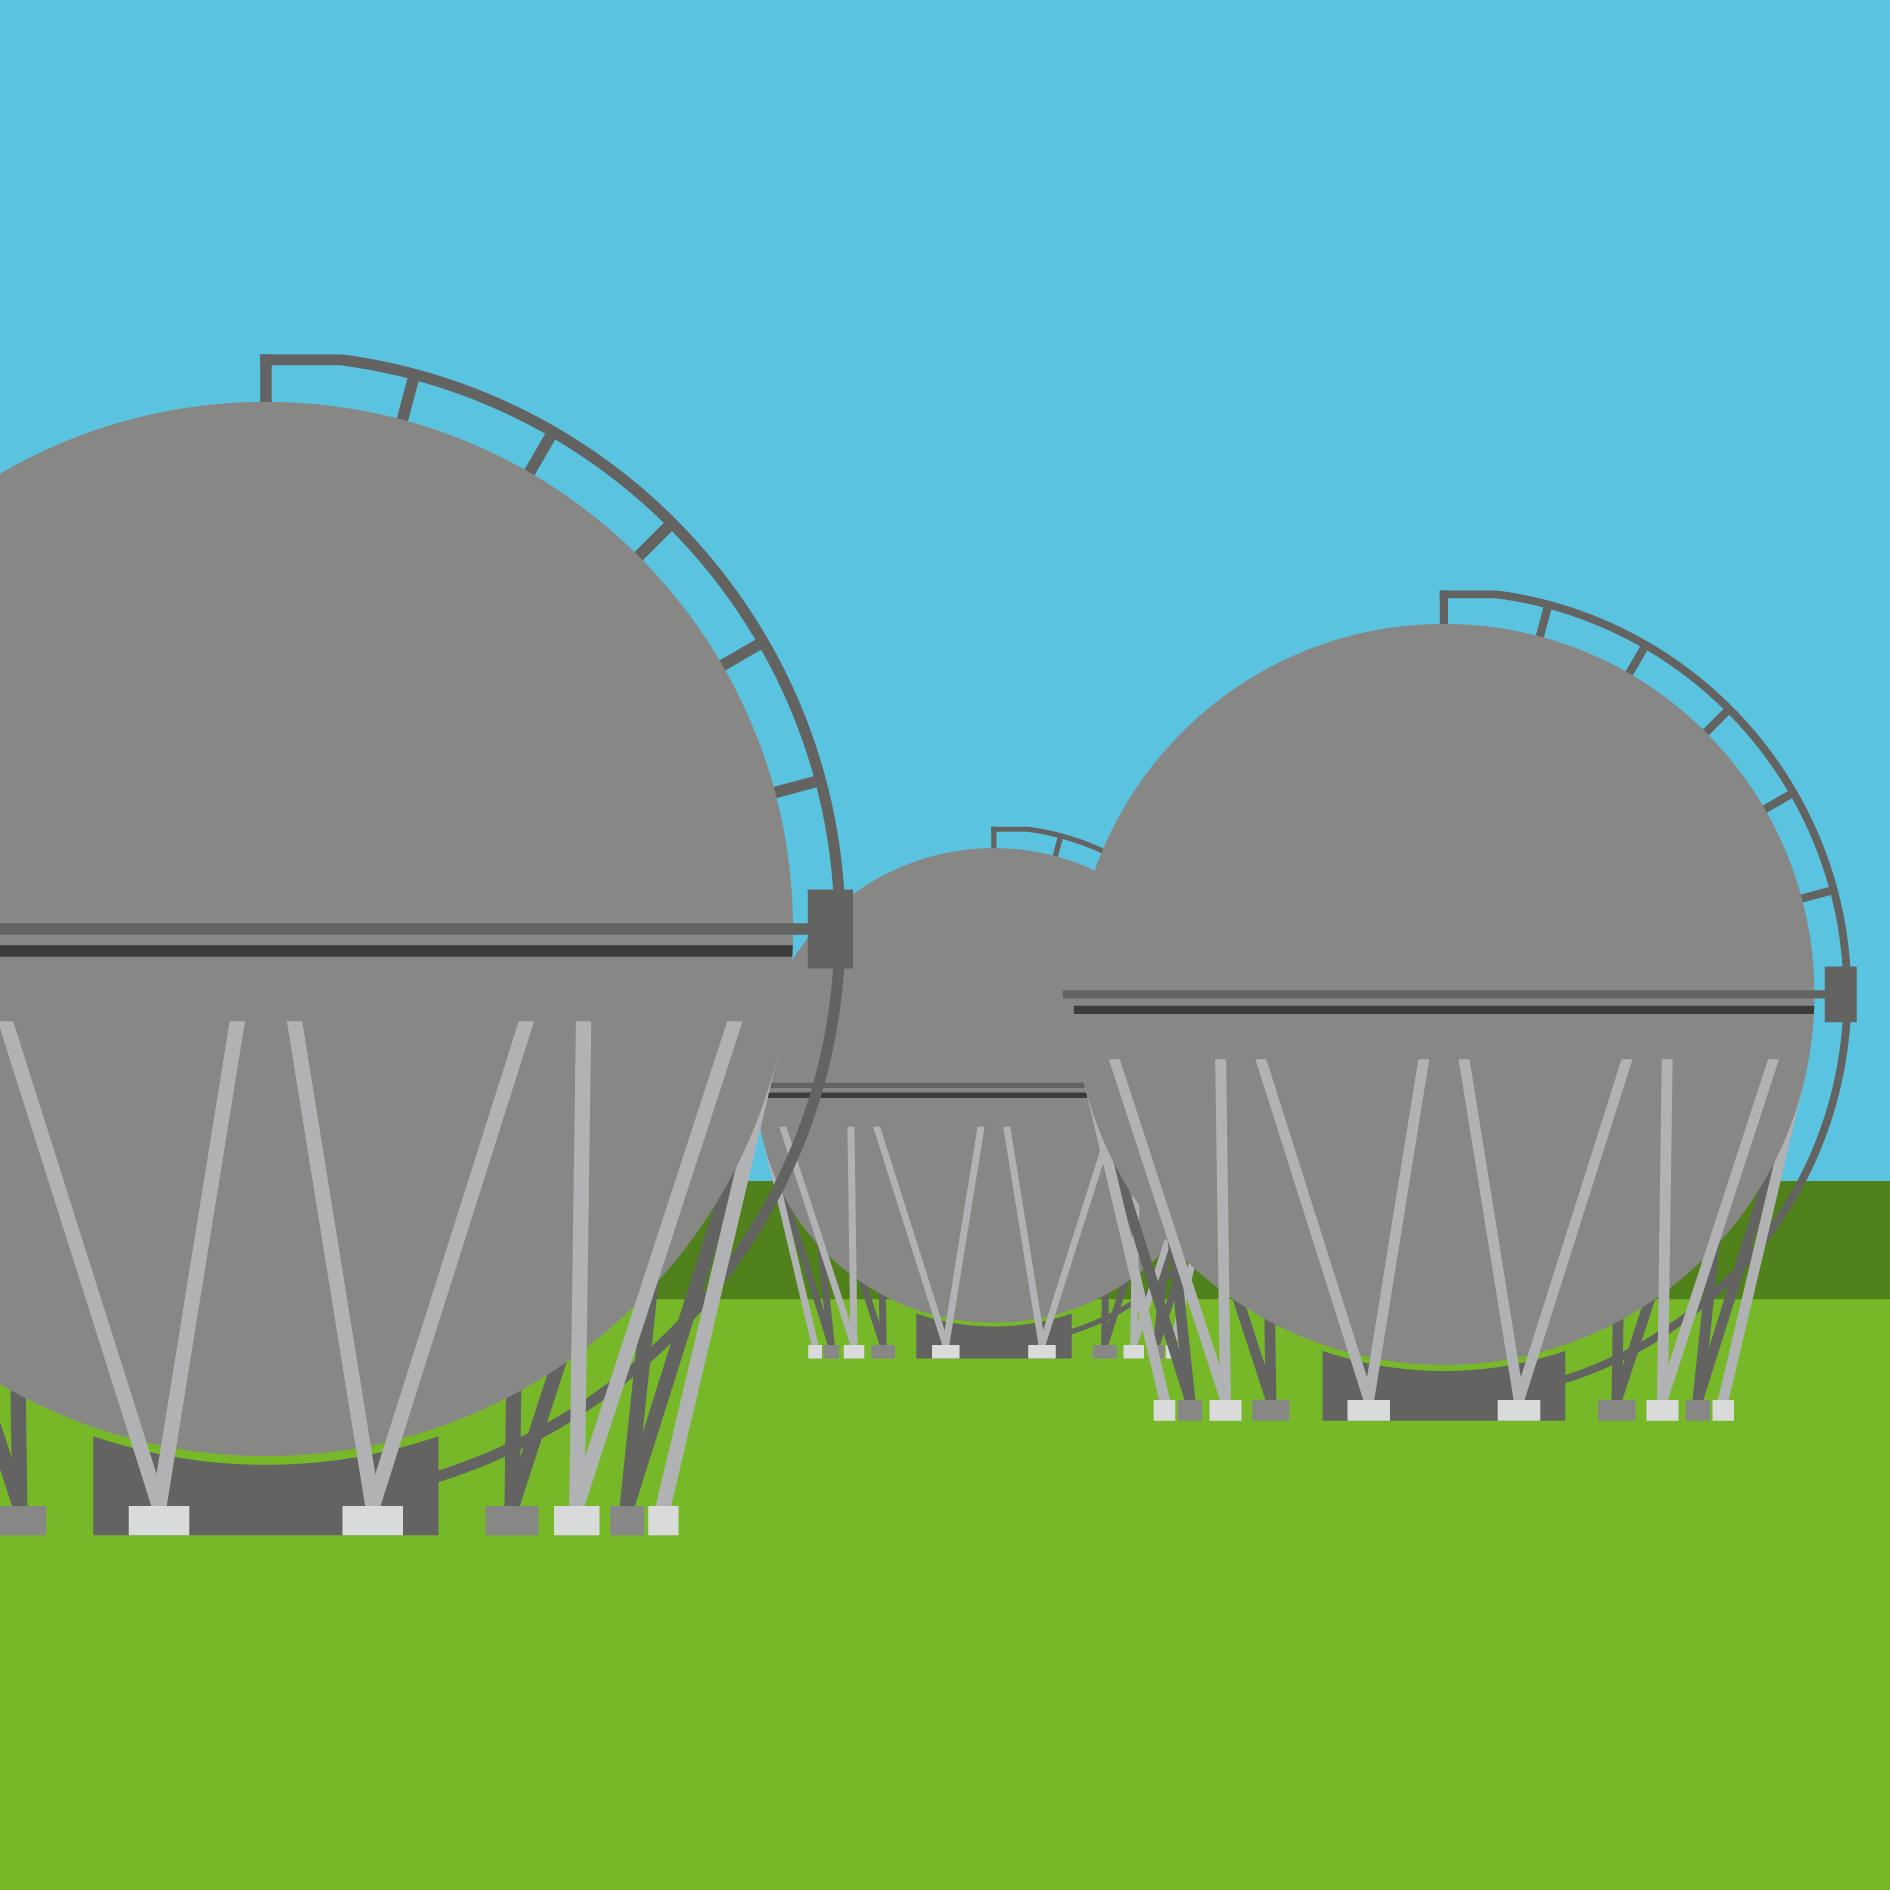 Gasballons